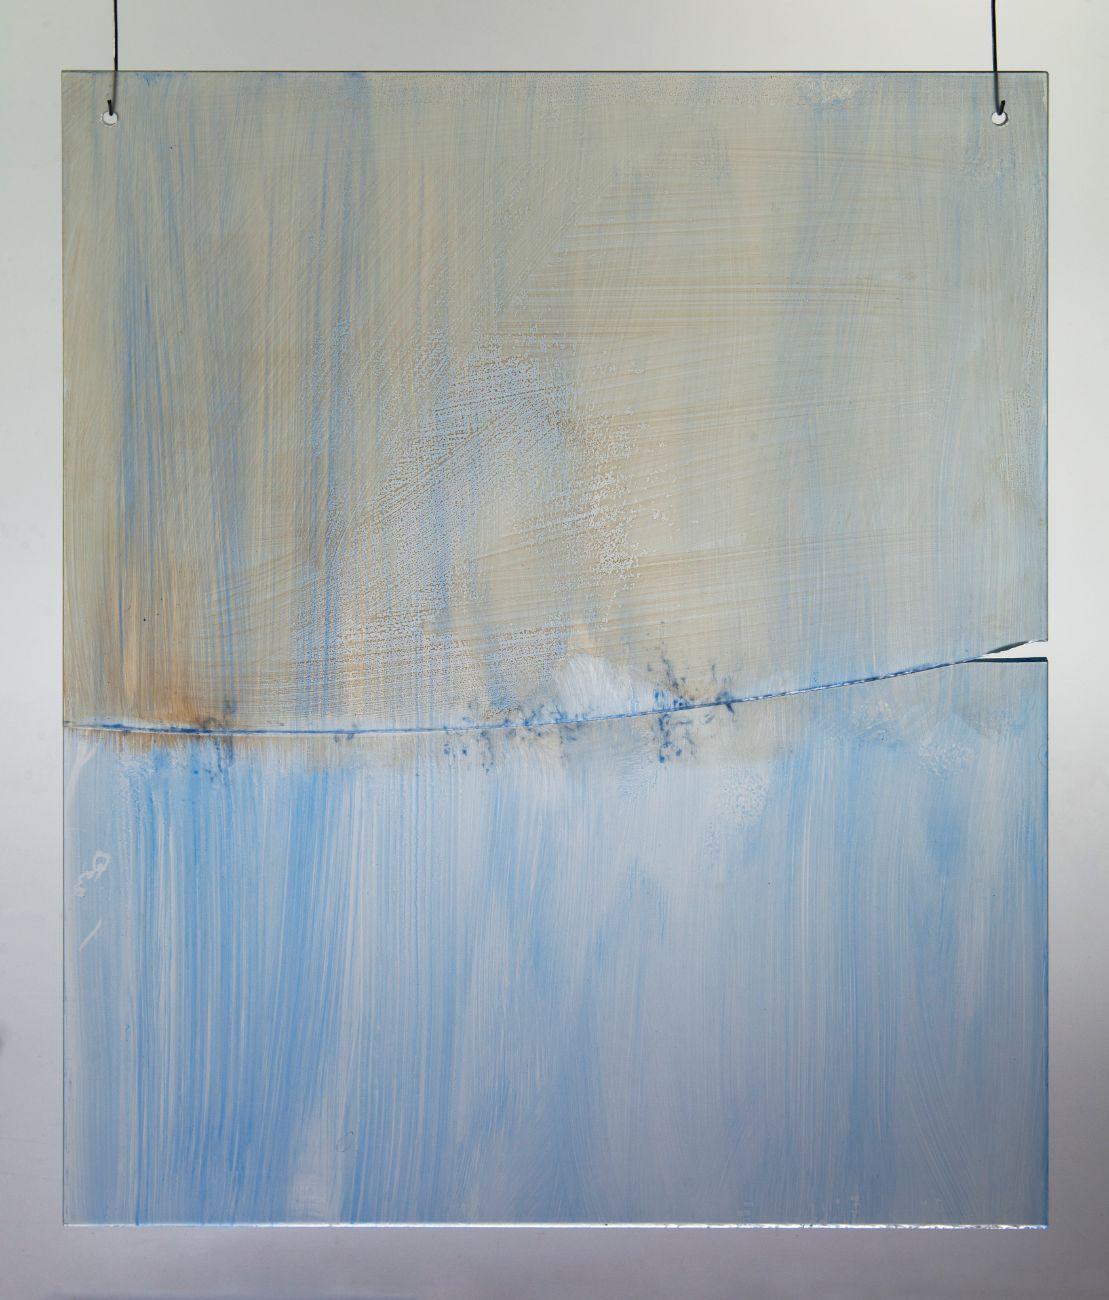 6, 40x50cm, maľba na skle, 2018